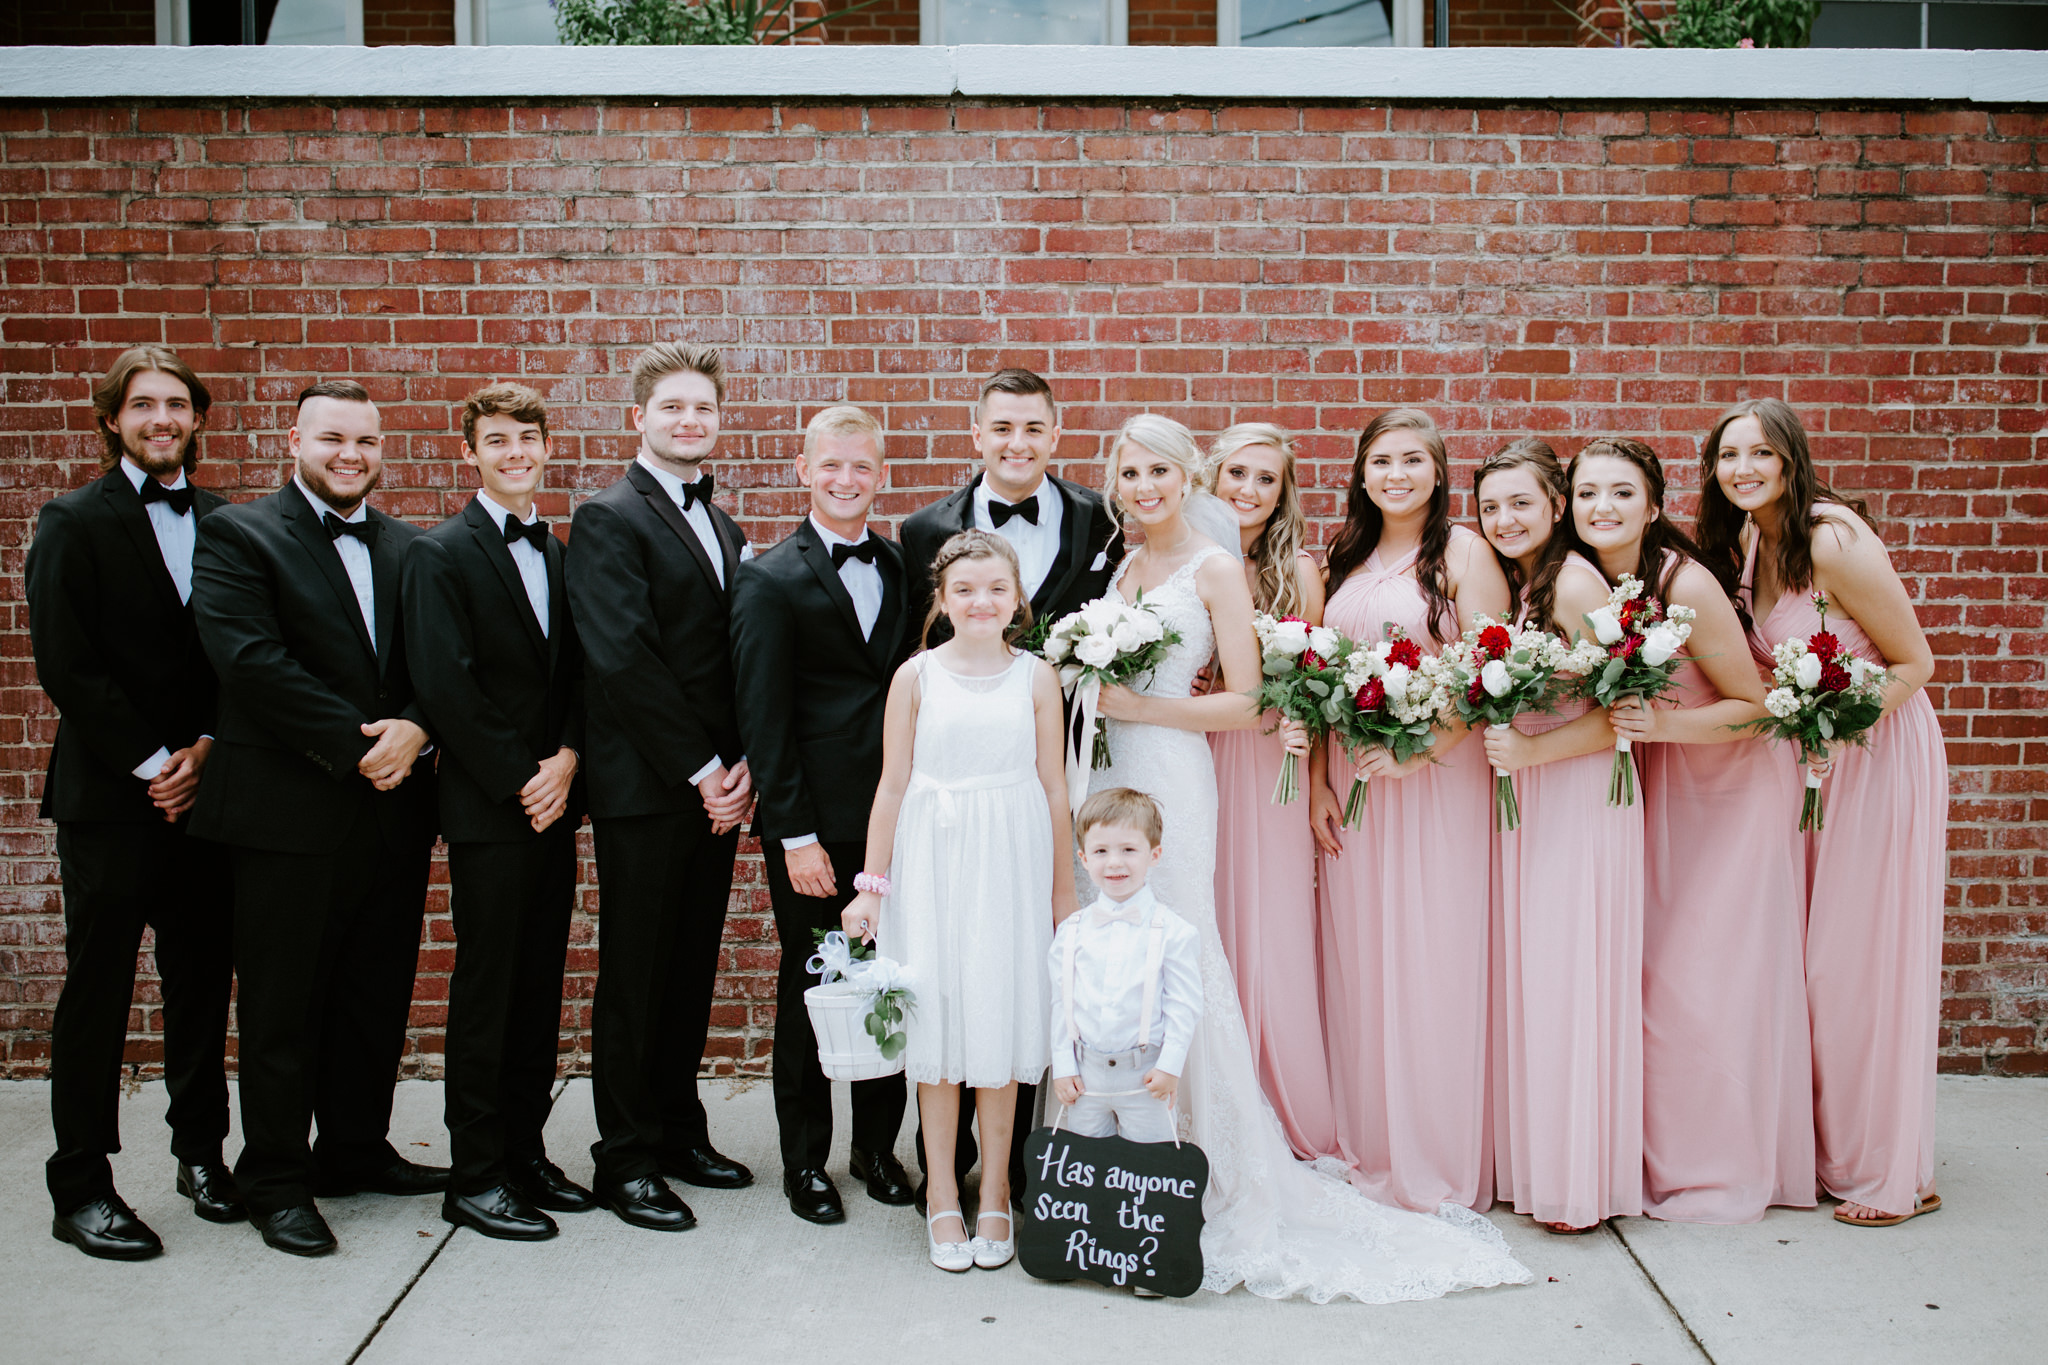 Kayley + Robert + Chattanooga + Nashville + Tennessee + Wedding + Photographer-1-2.jpg